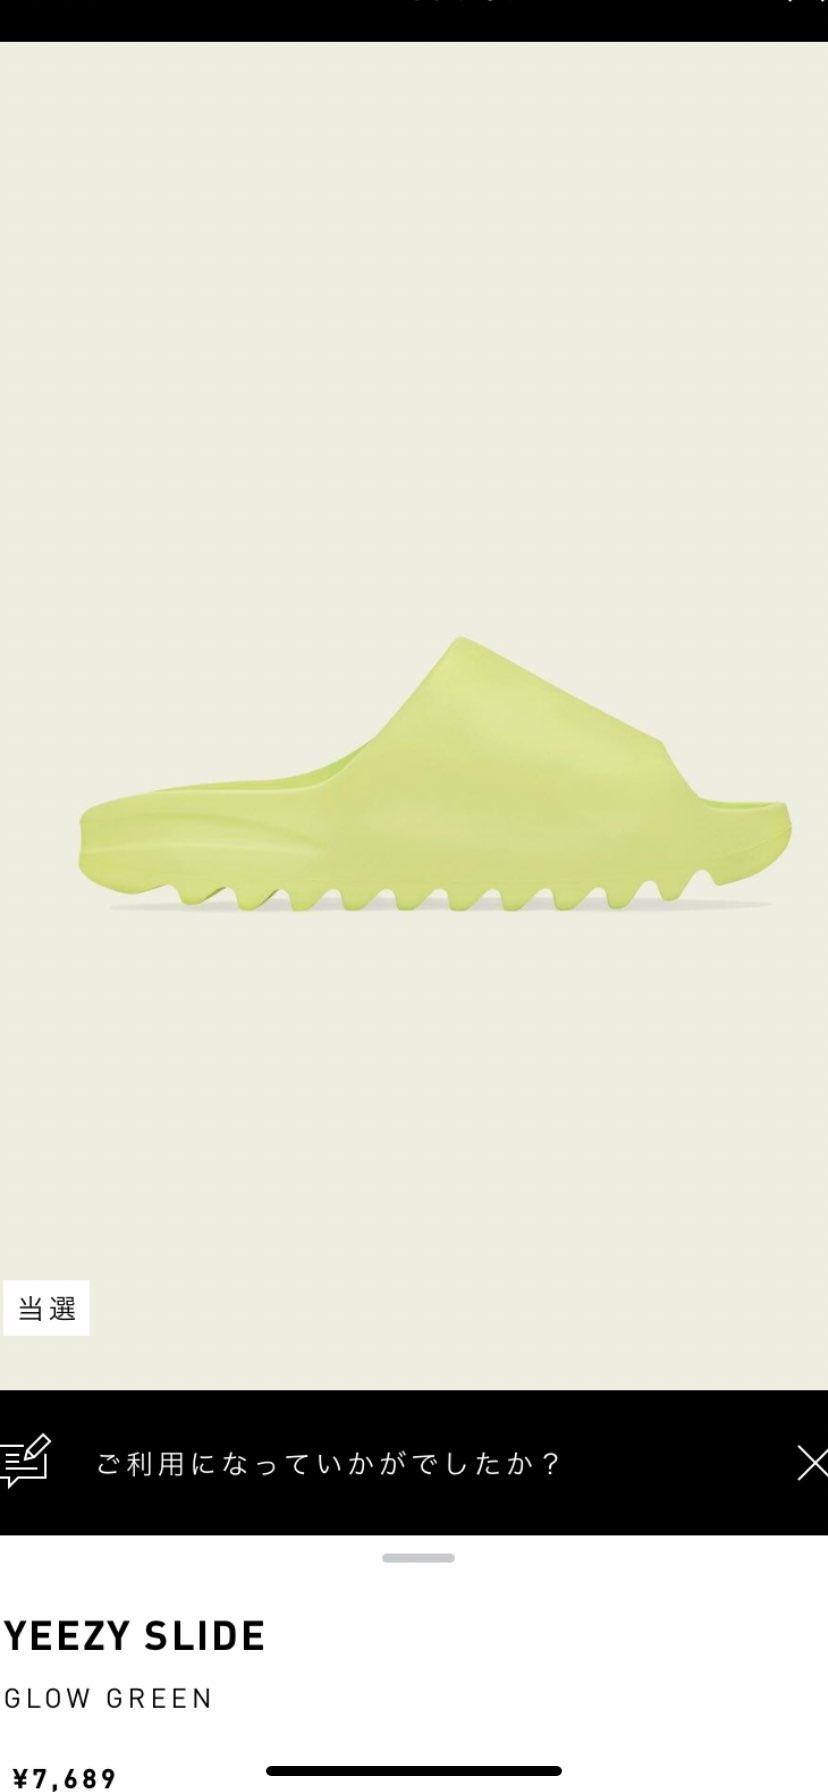 adidas公式にてやっとこさ初当選!😂 初のyeezyslideどんな履き心